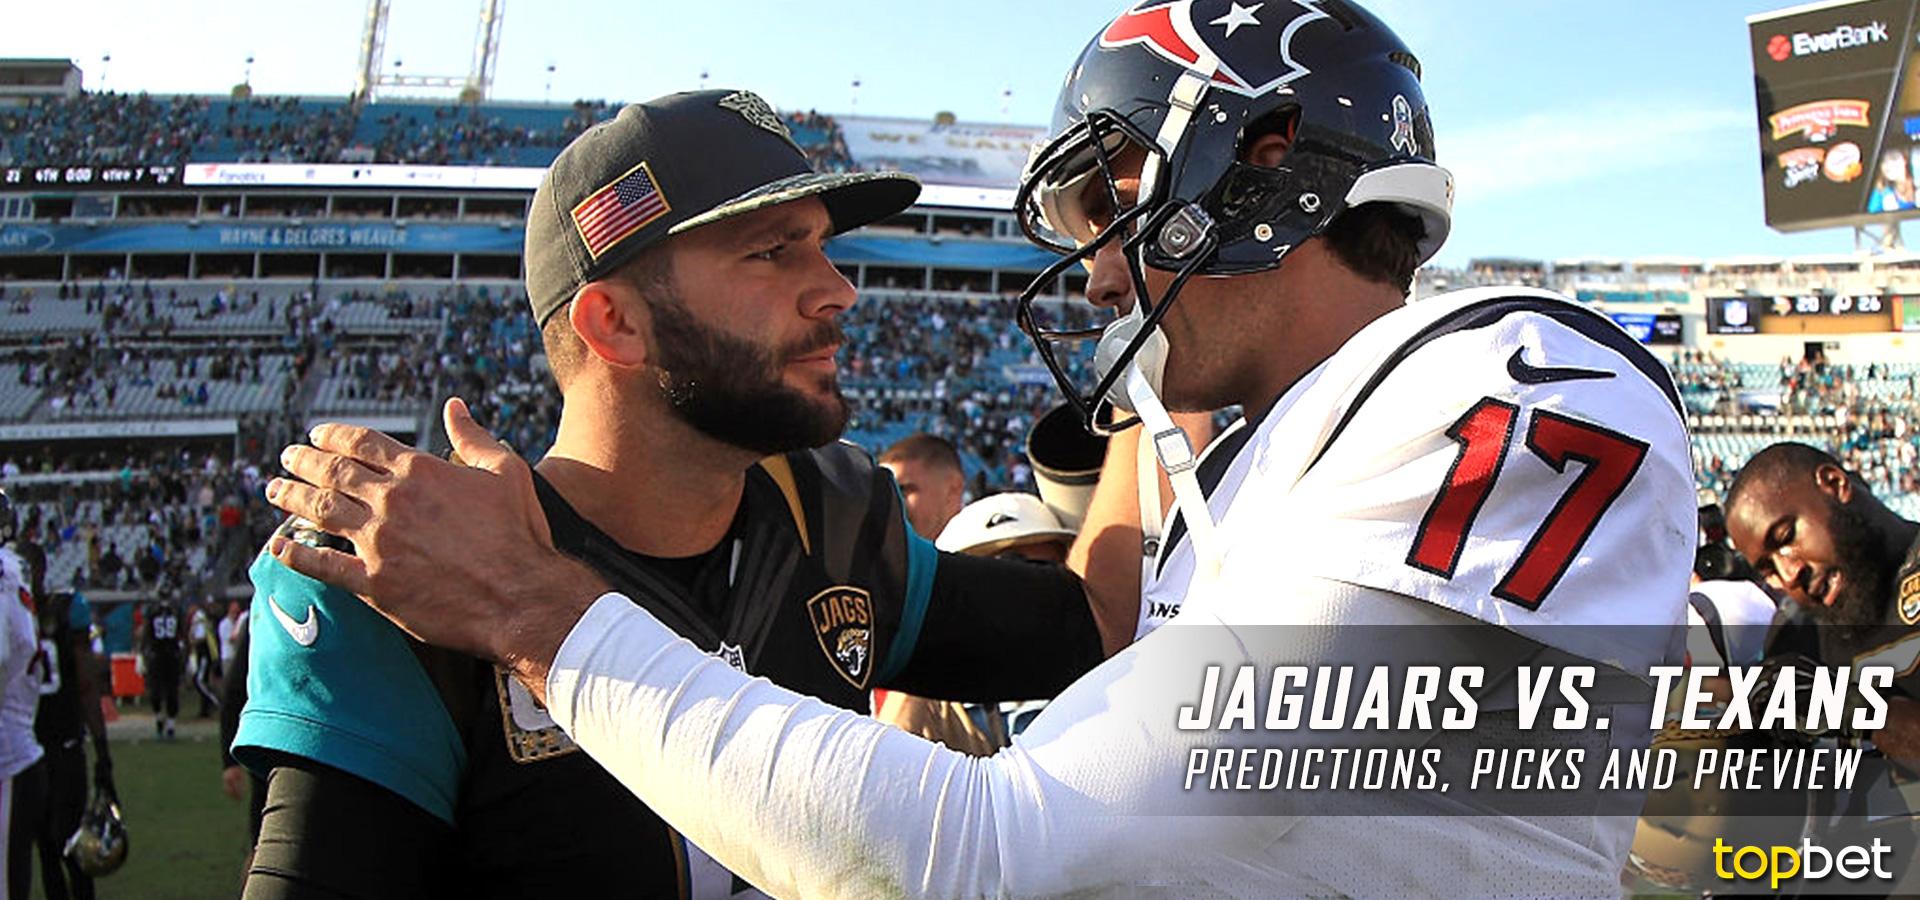 Marvelous Jacksonville Jaguars Vs Houston Texans Predictions And Picks